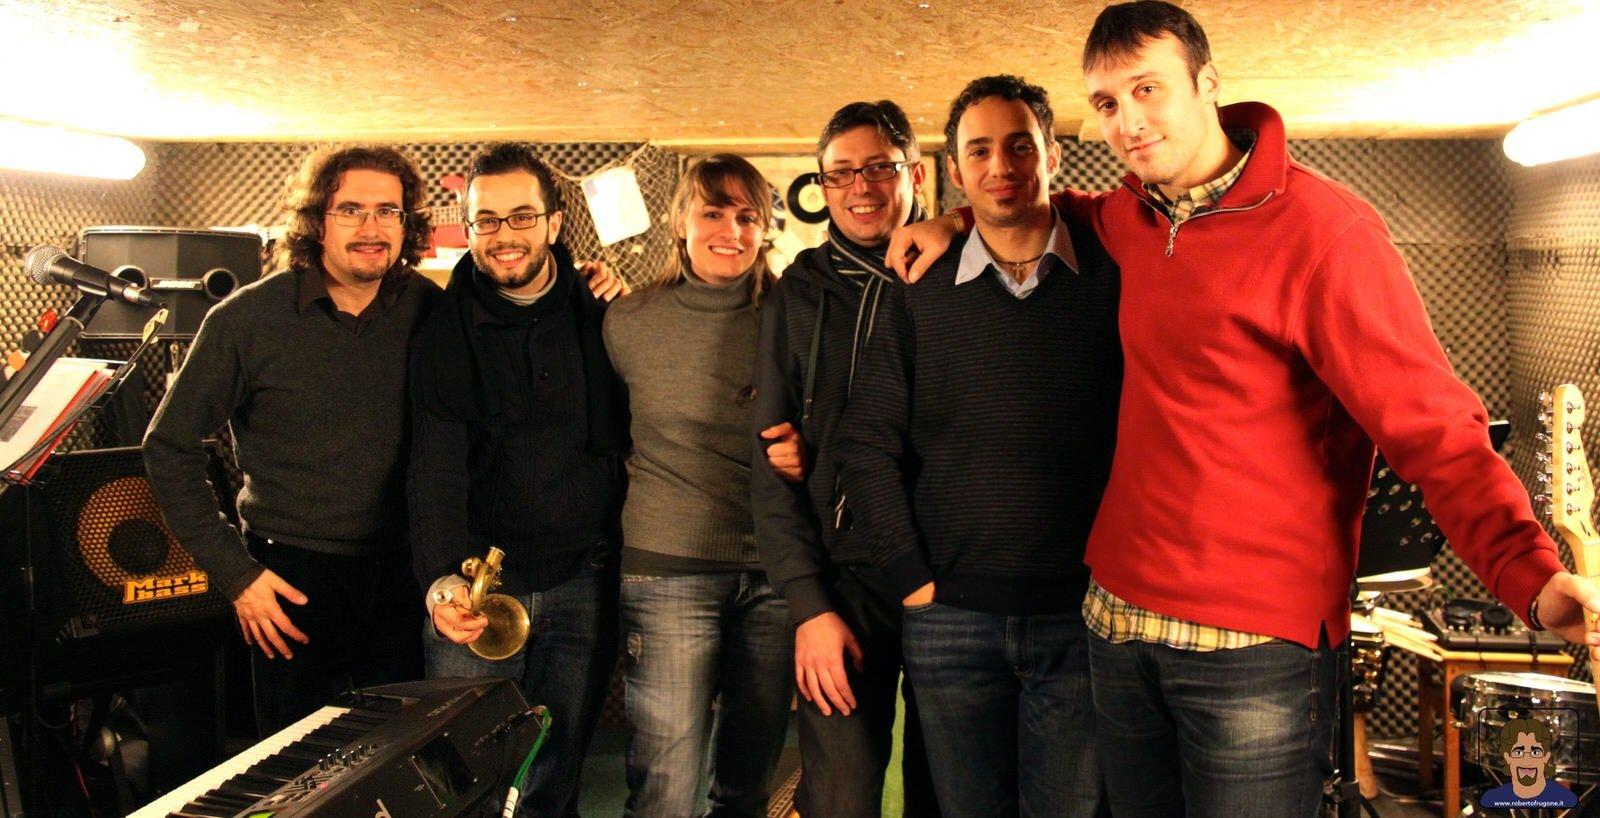 Totem Studio Sala Prove Musicali Casarza Ligure Roberto Frugone Band 2010